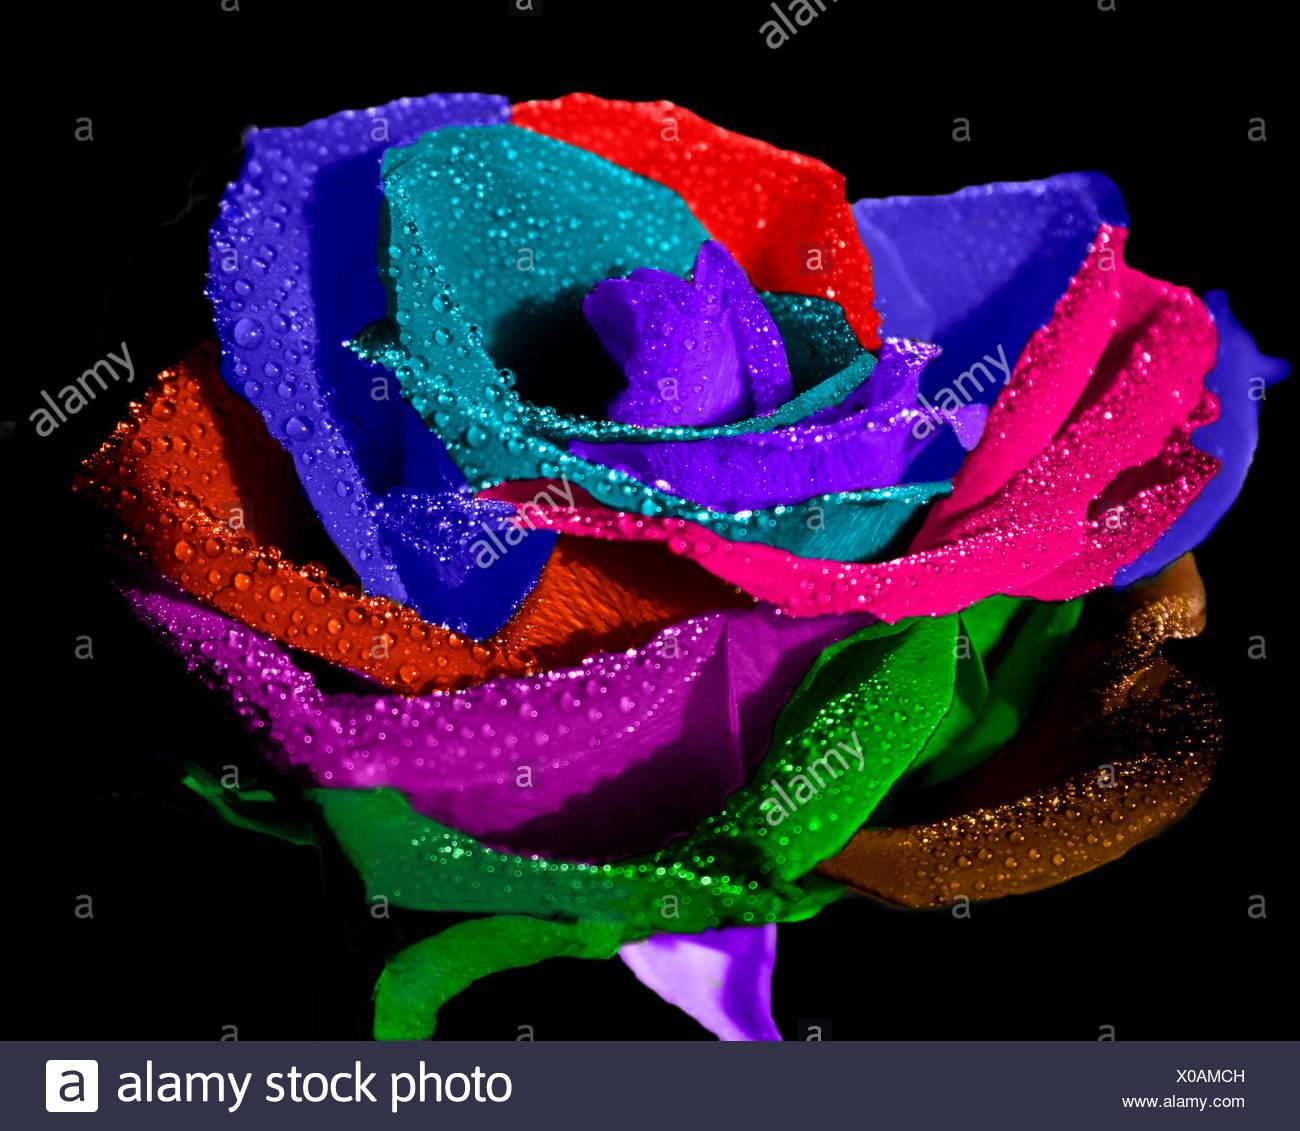 pop art rose - Stock Image